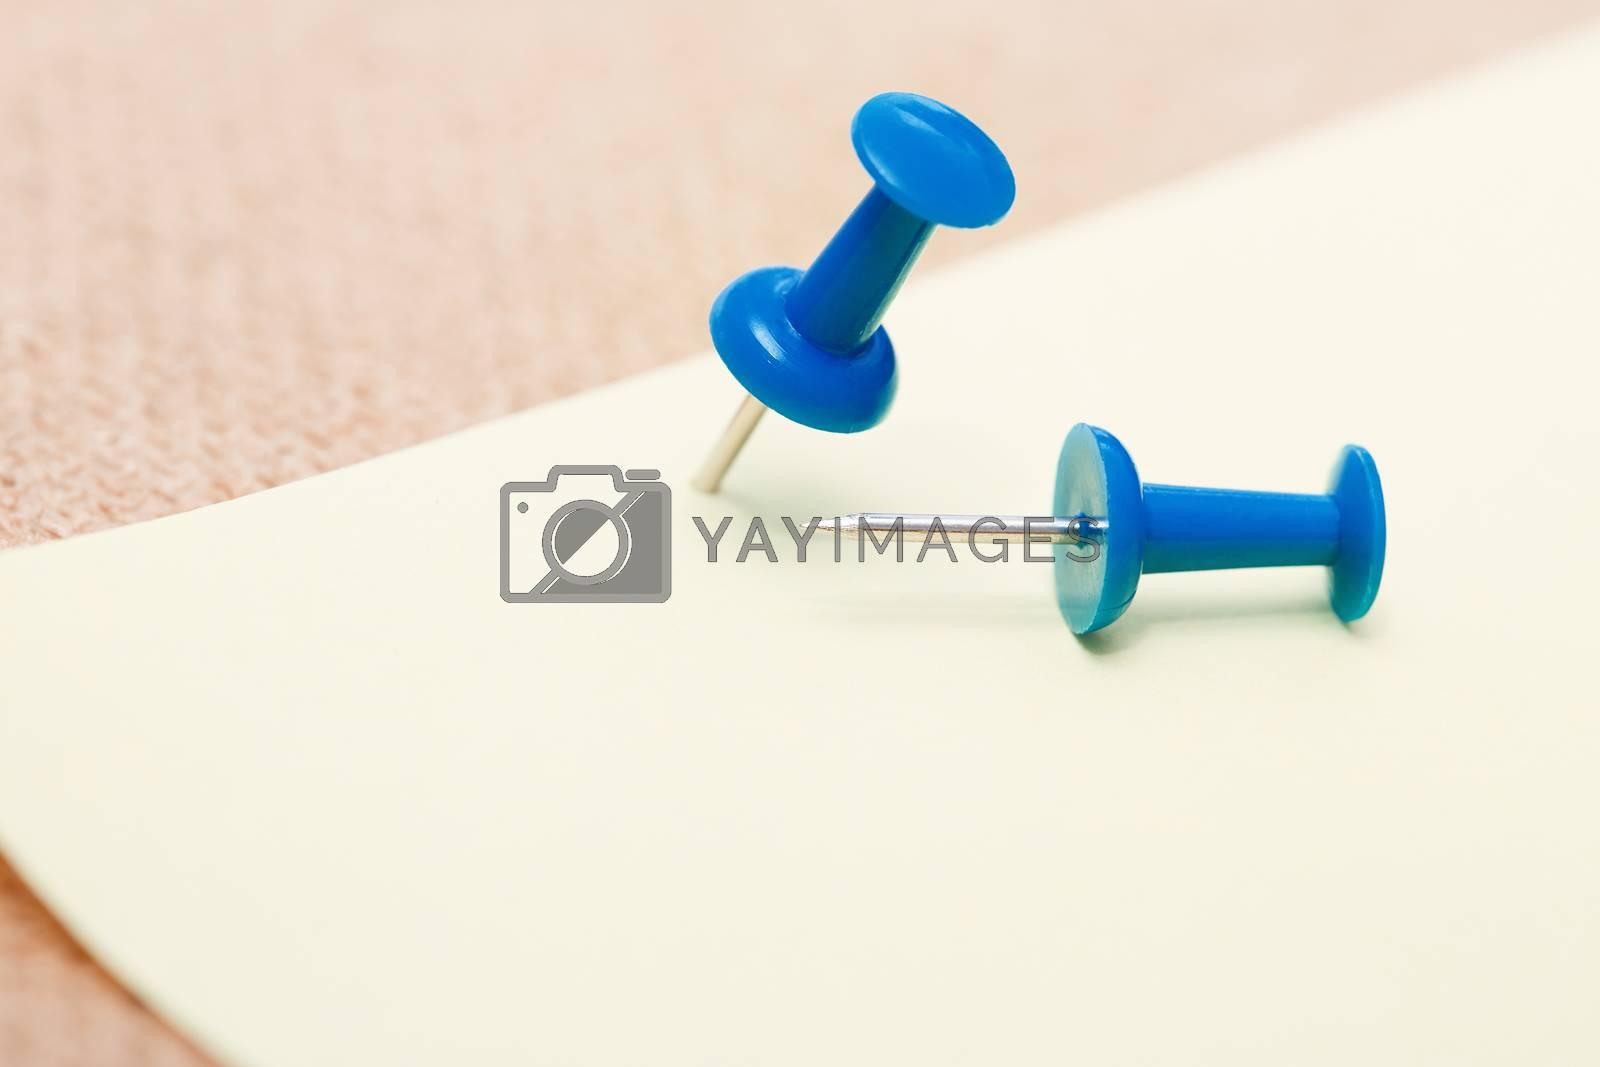 Adhesive note and blue pushpins. Close-up view